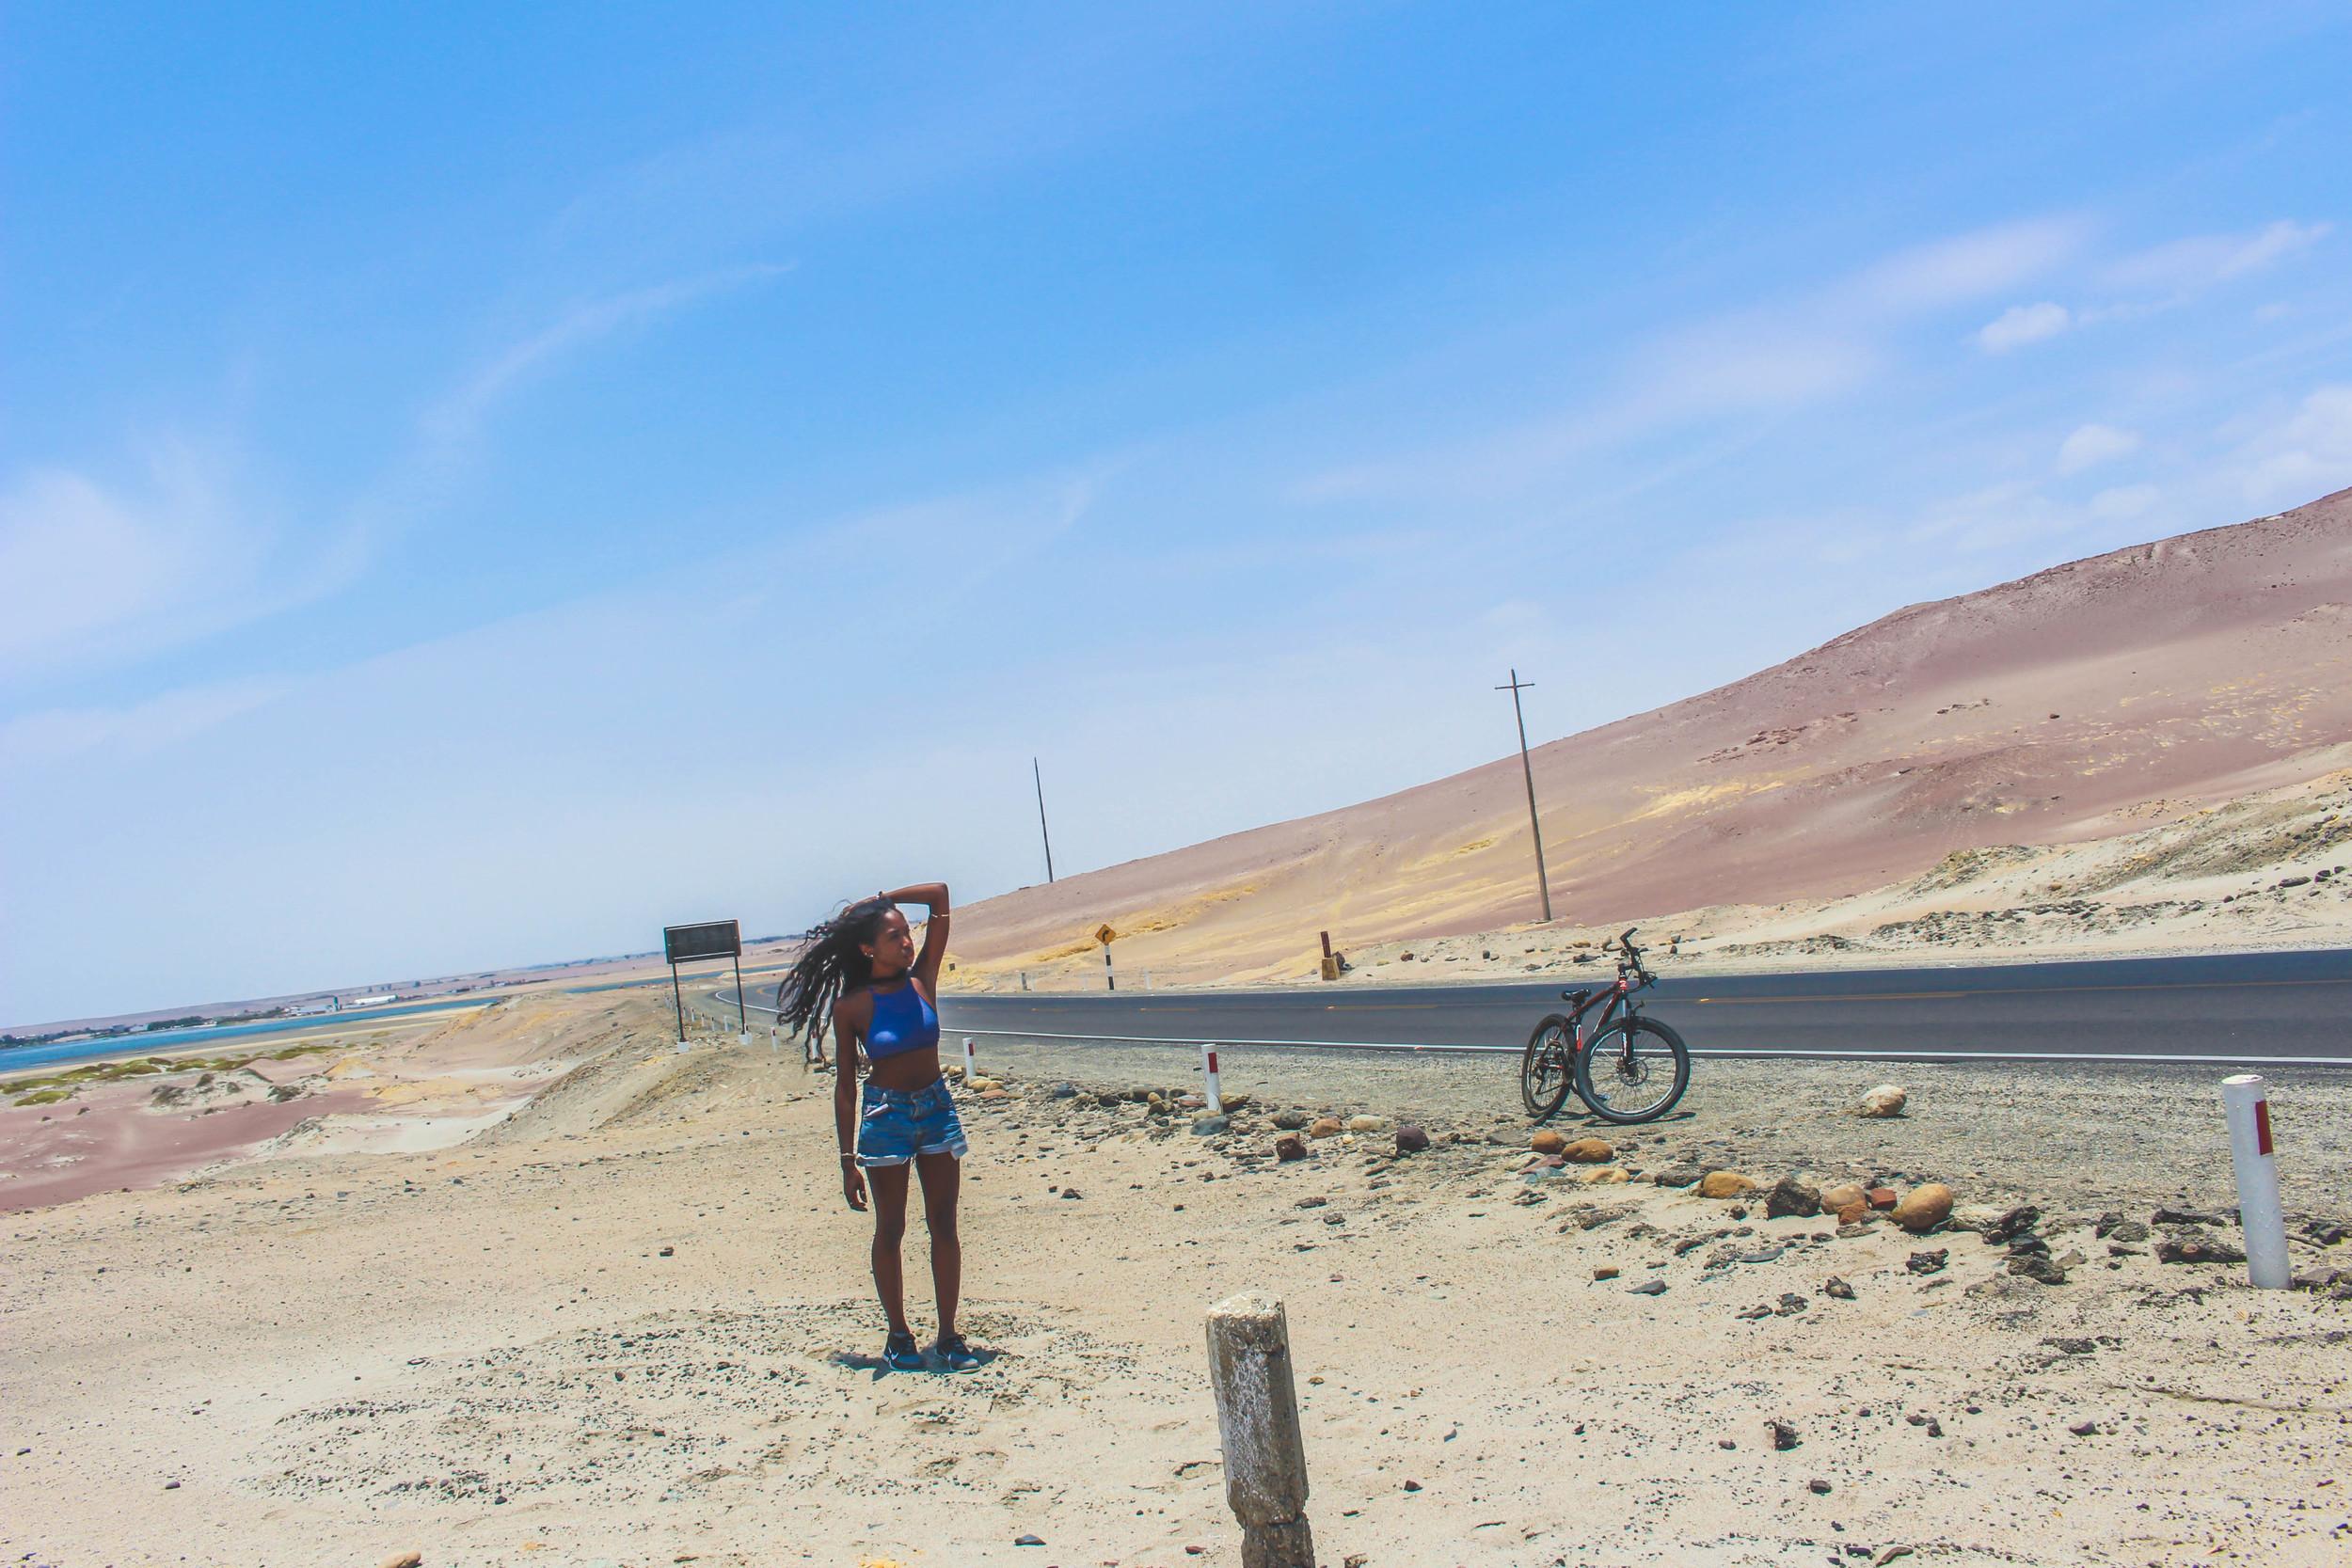 Paracas, Peru by Nneya Richards